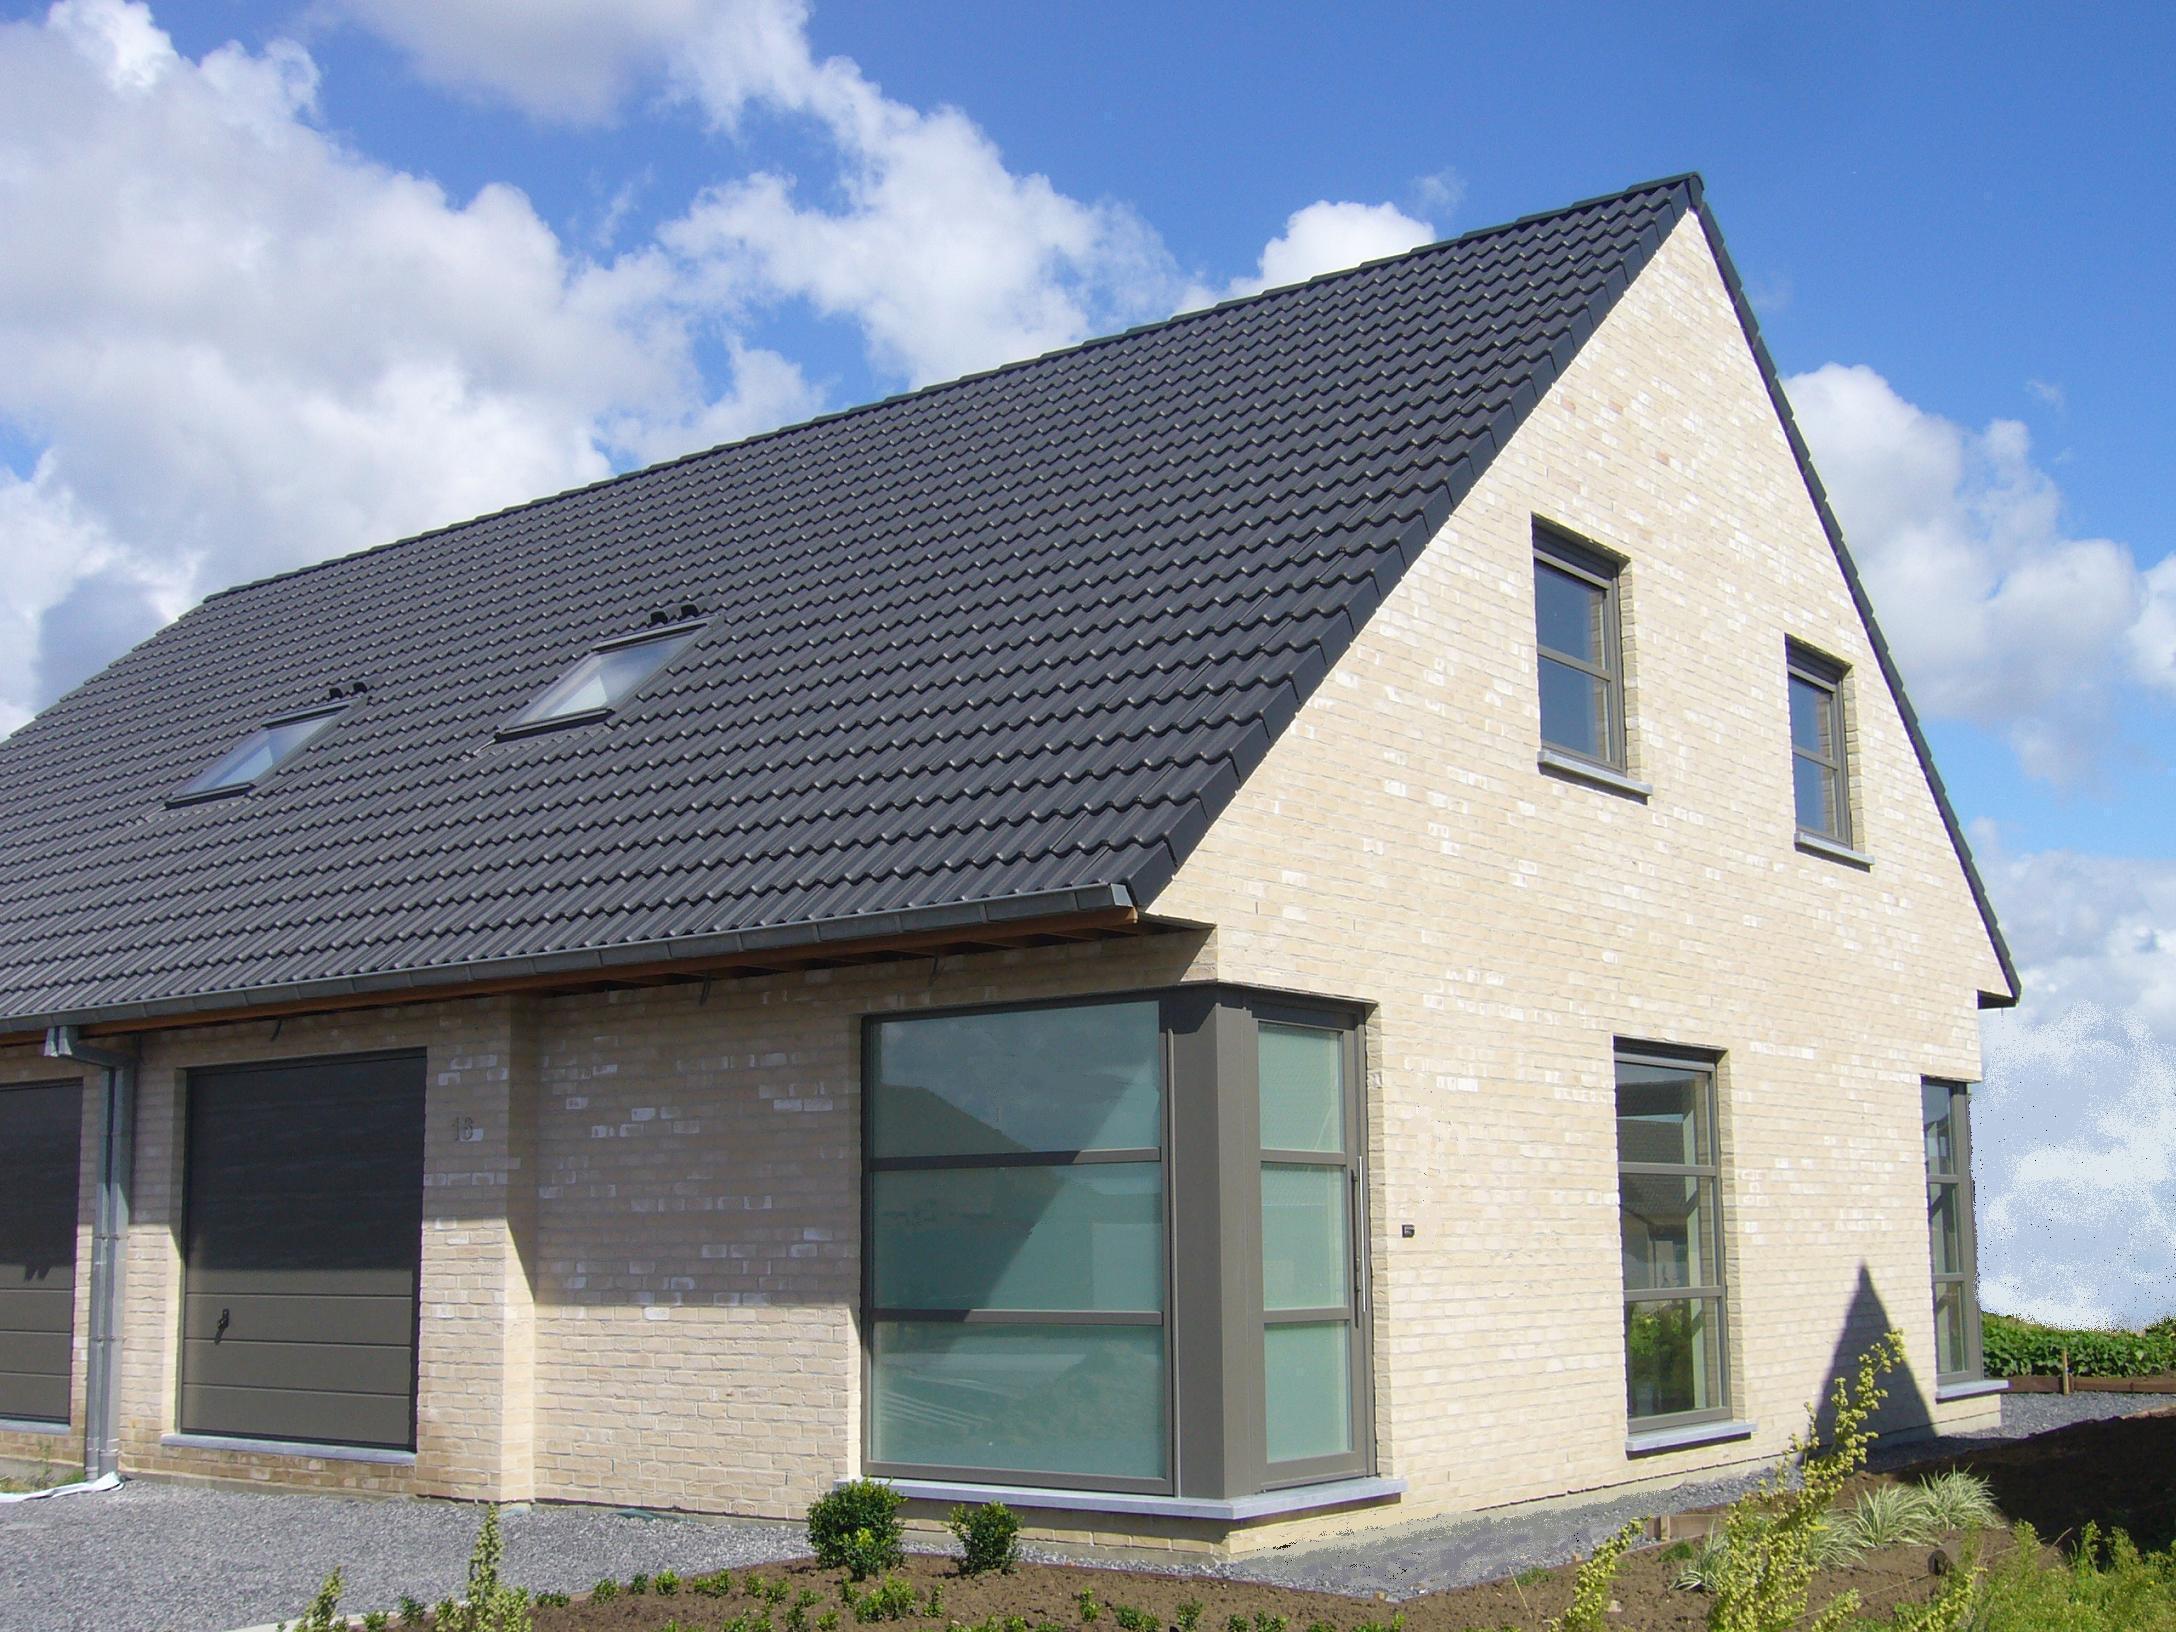 Huis te koop in izegem dupont woningen for Te koop moderne woning